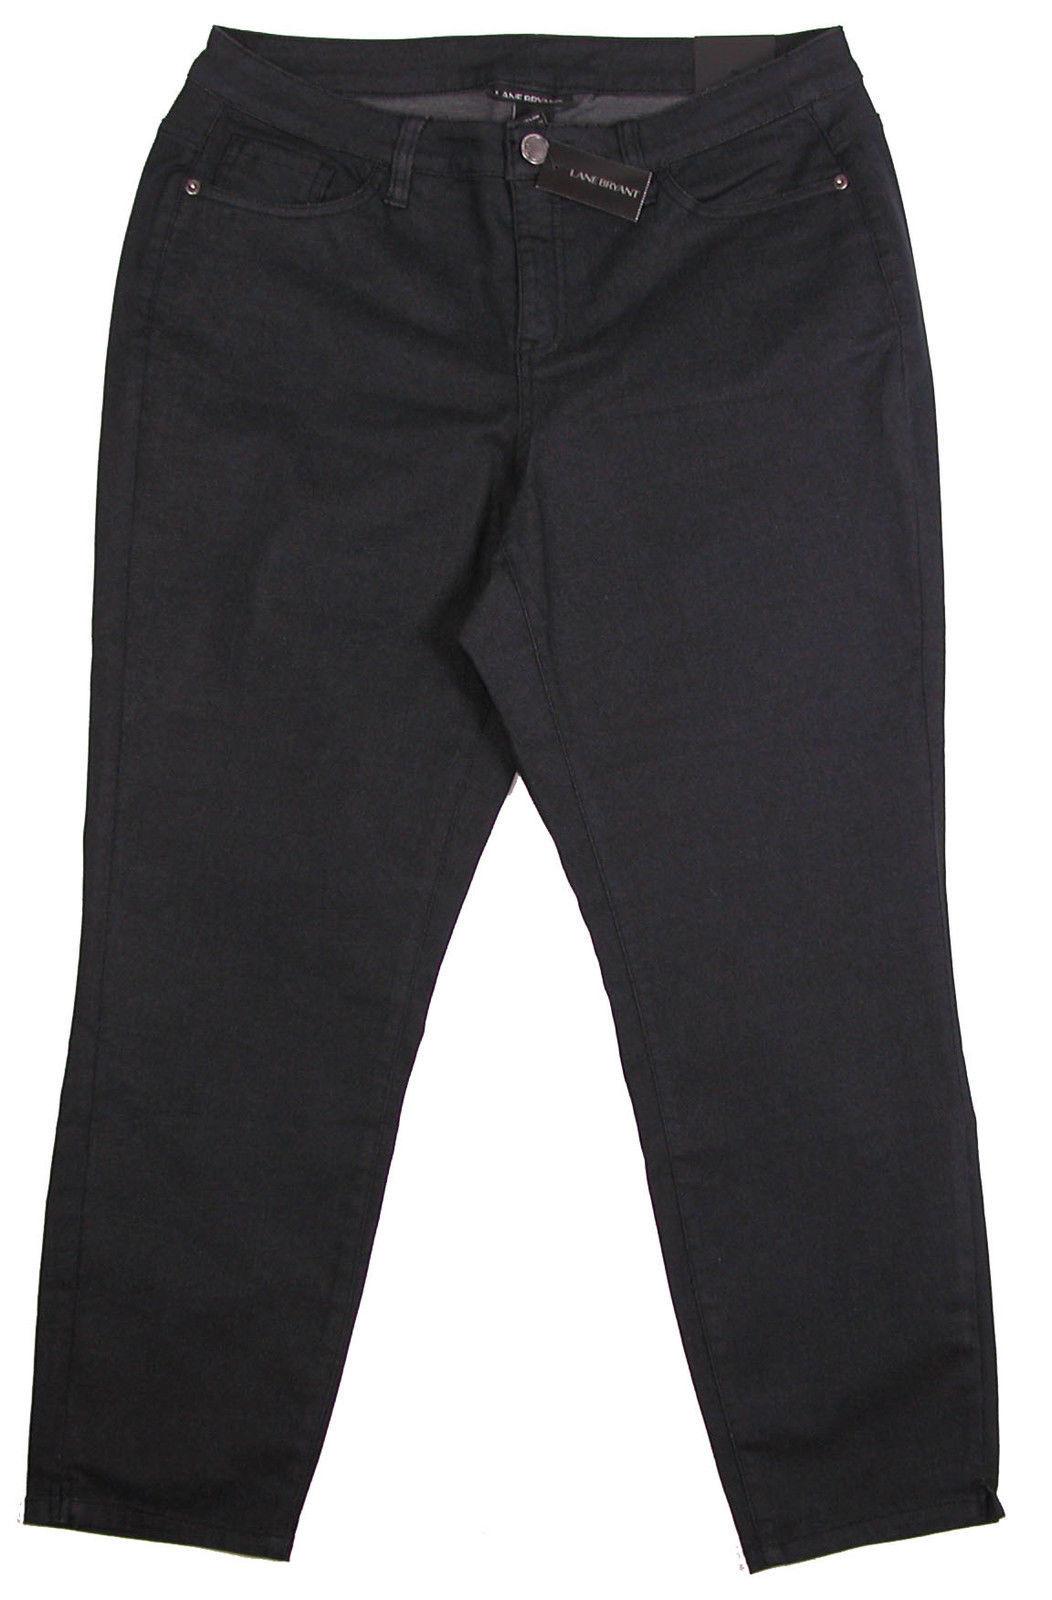 bd0a6fb42fd Lane Bryant Womens Capri Jeans 18 Skinny Stretch Cropped Black Denim Plus  New -  34.00